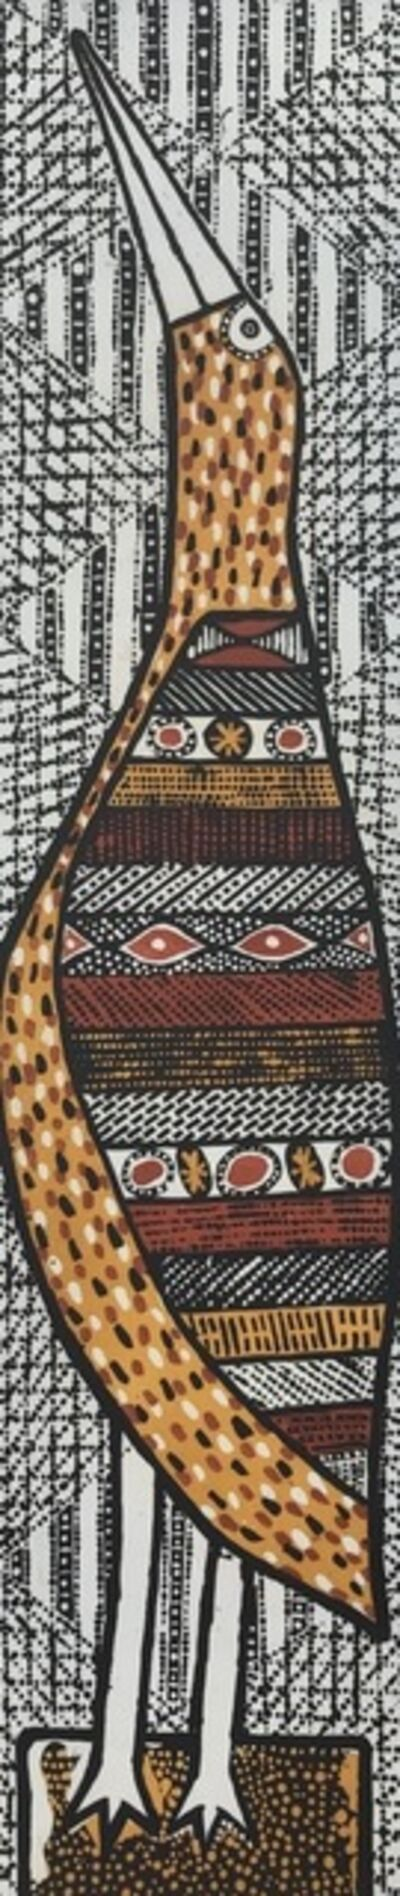 Janice Murray Pungautiji, 'Jongijongini Jilamarini', 2017